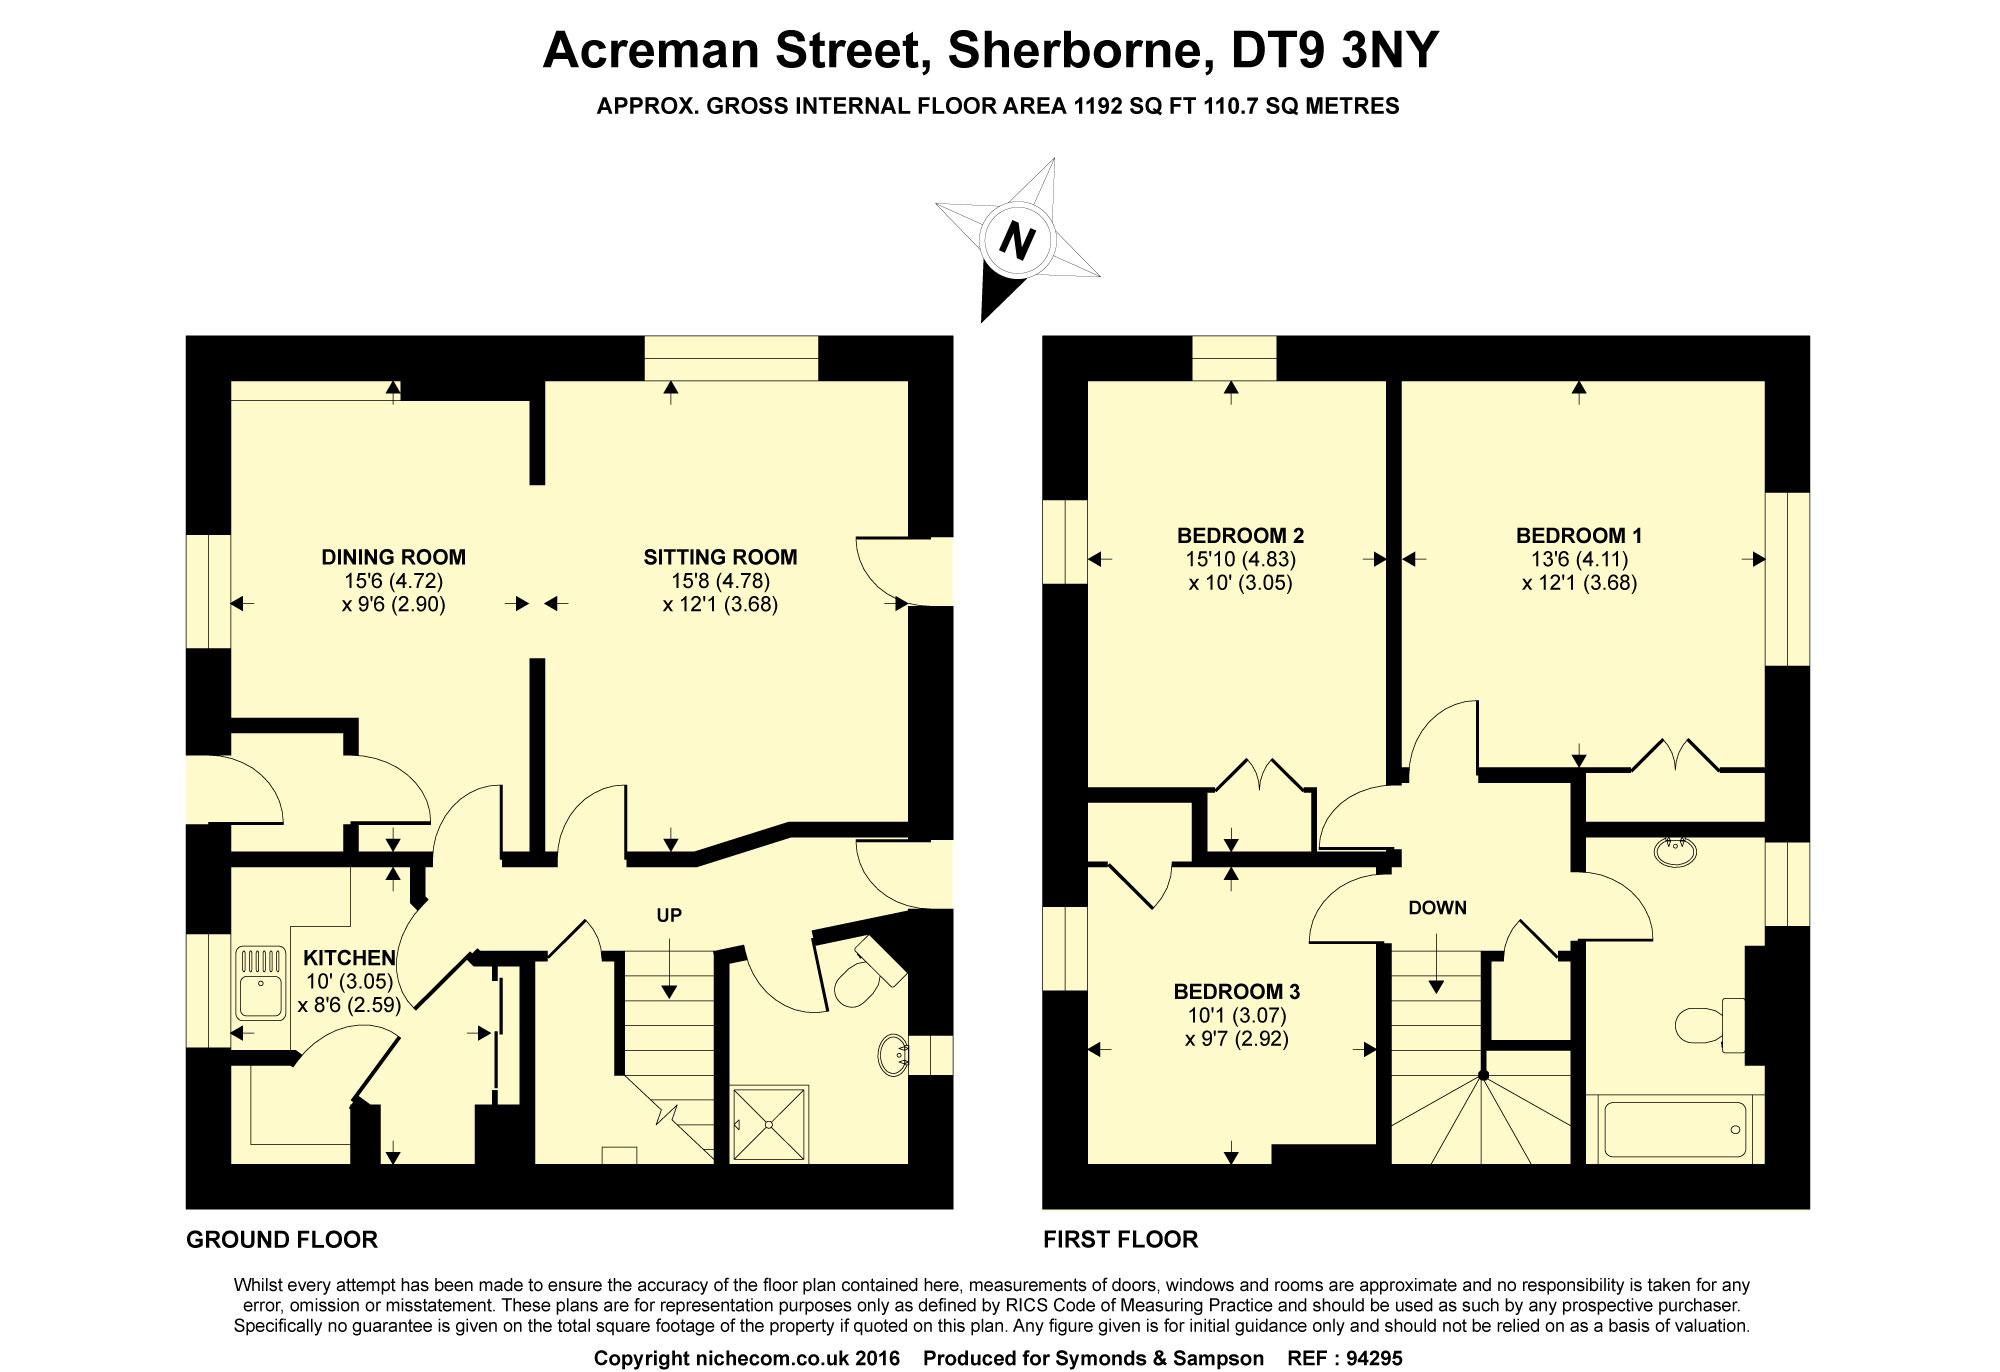 Floorplan - Acreman Street, Sherborne, Dorset, DT9 3NY